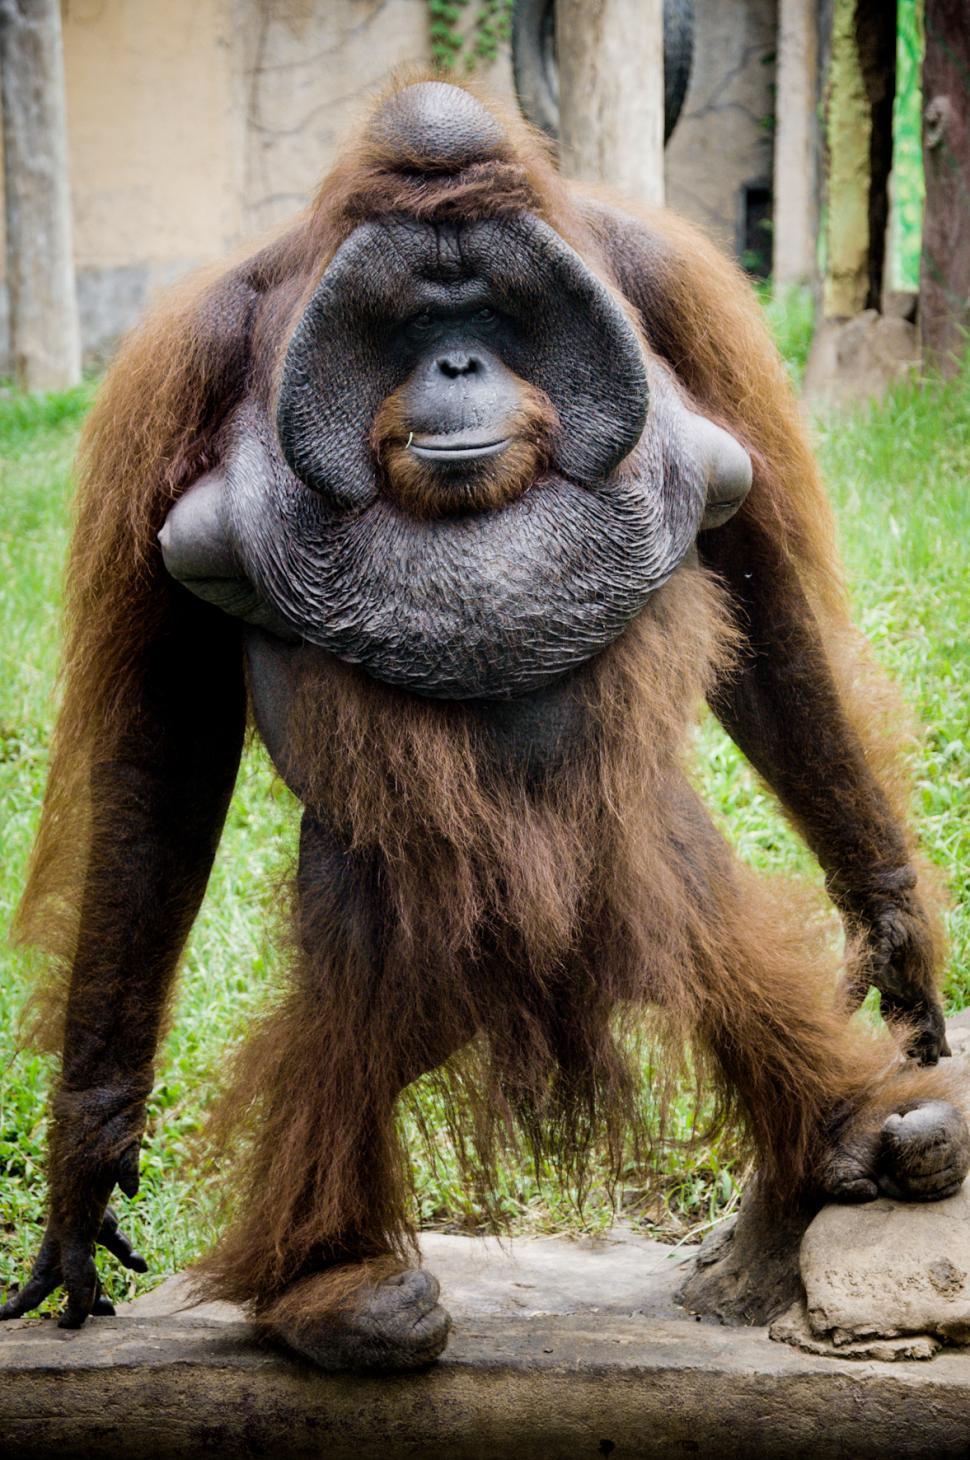 Download Free Stock Photo of Orangutan monkey